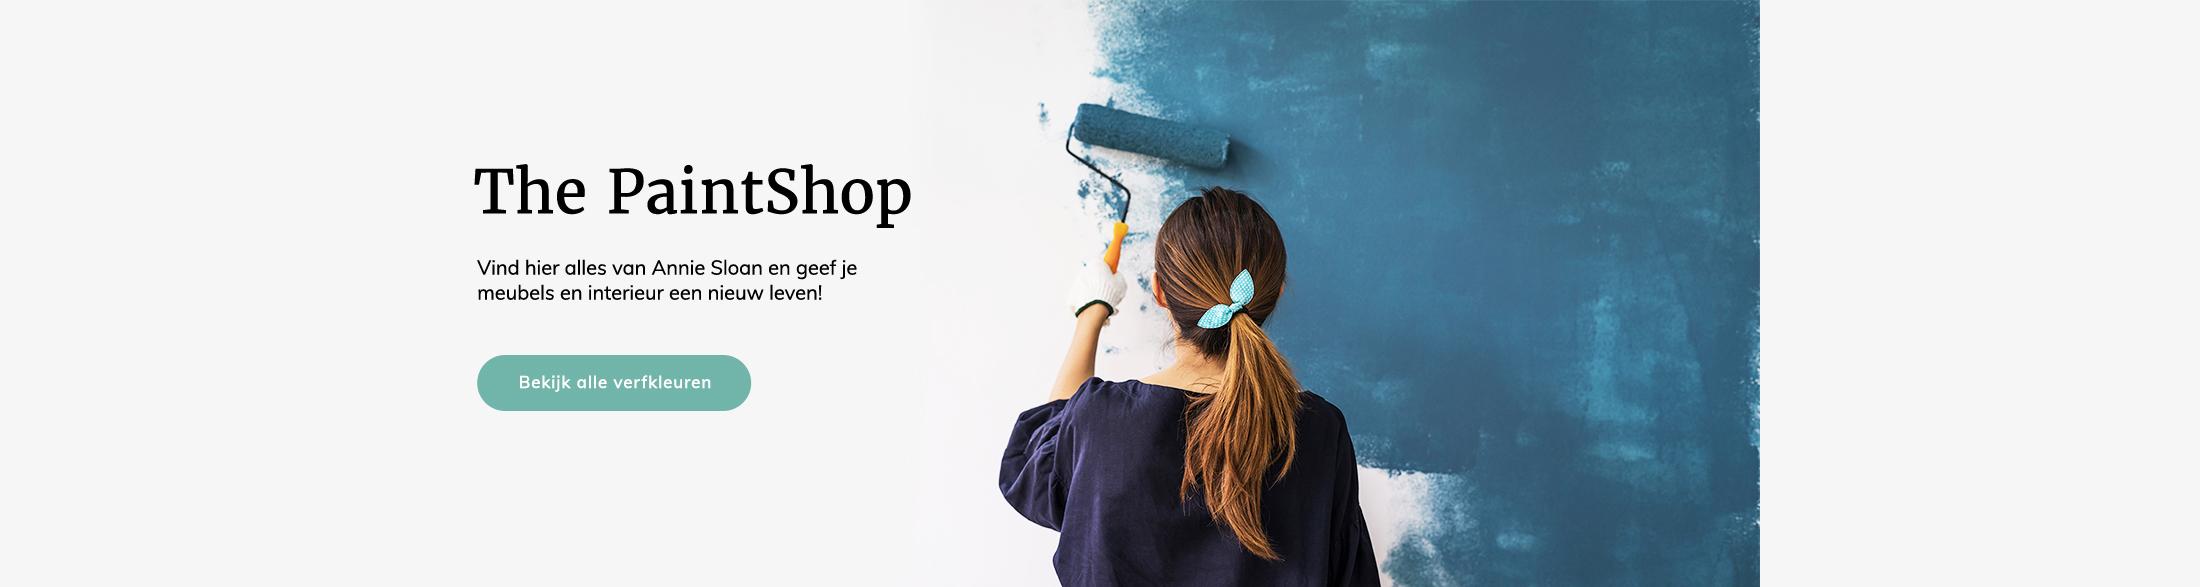 The paintshop - Anniesloan verf